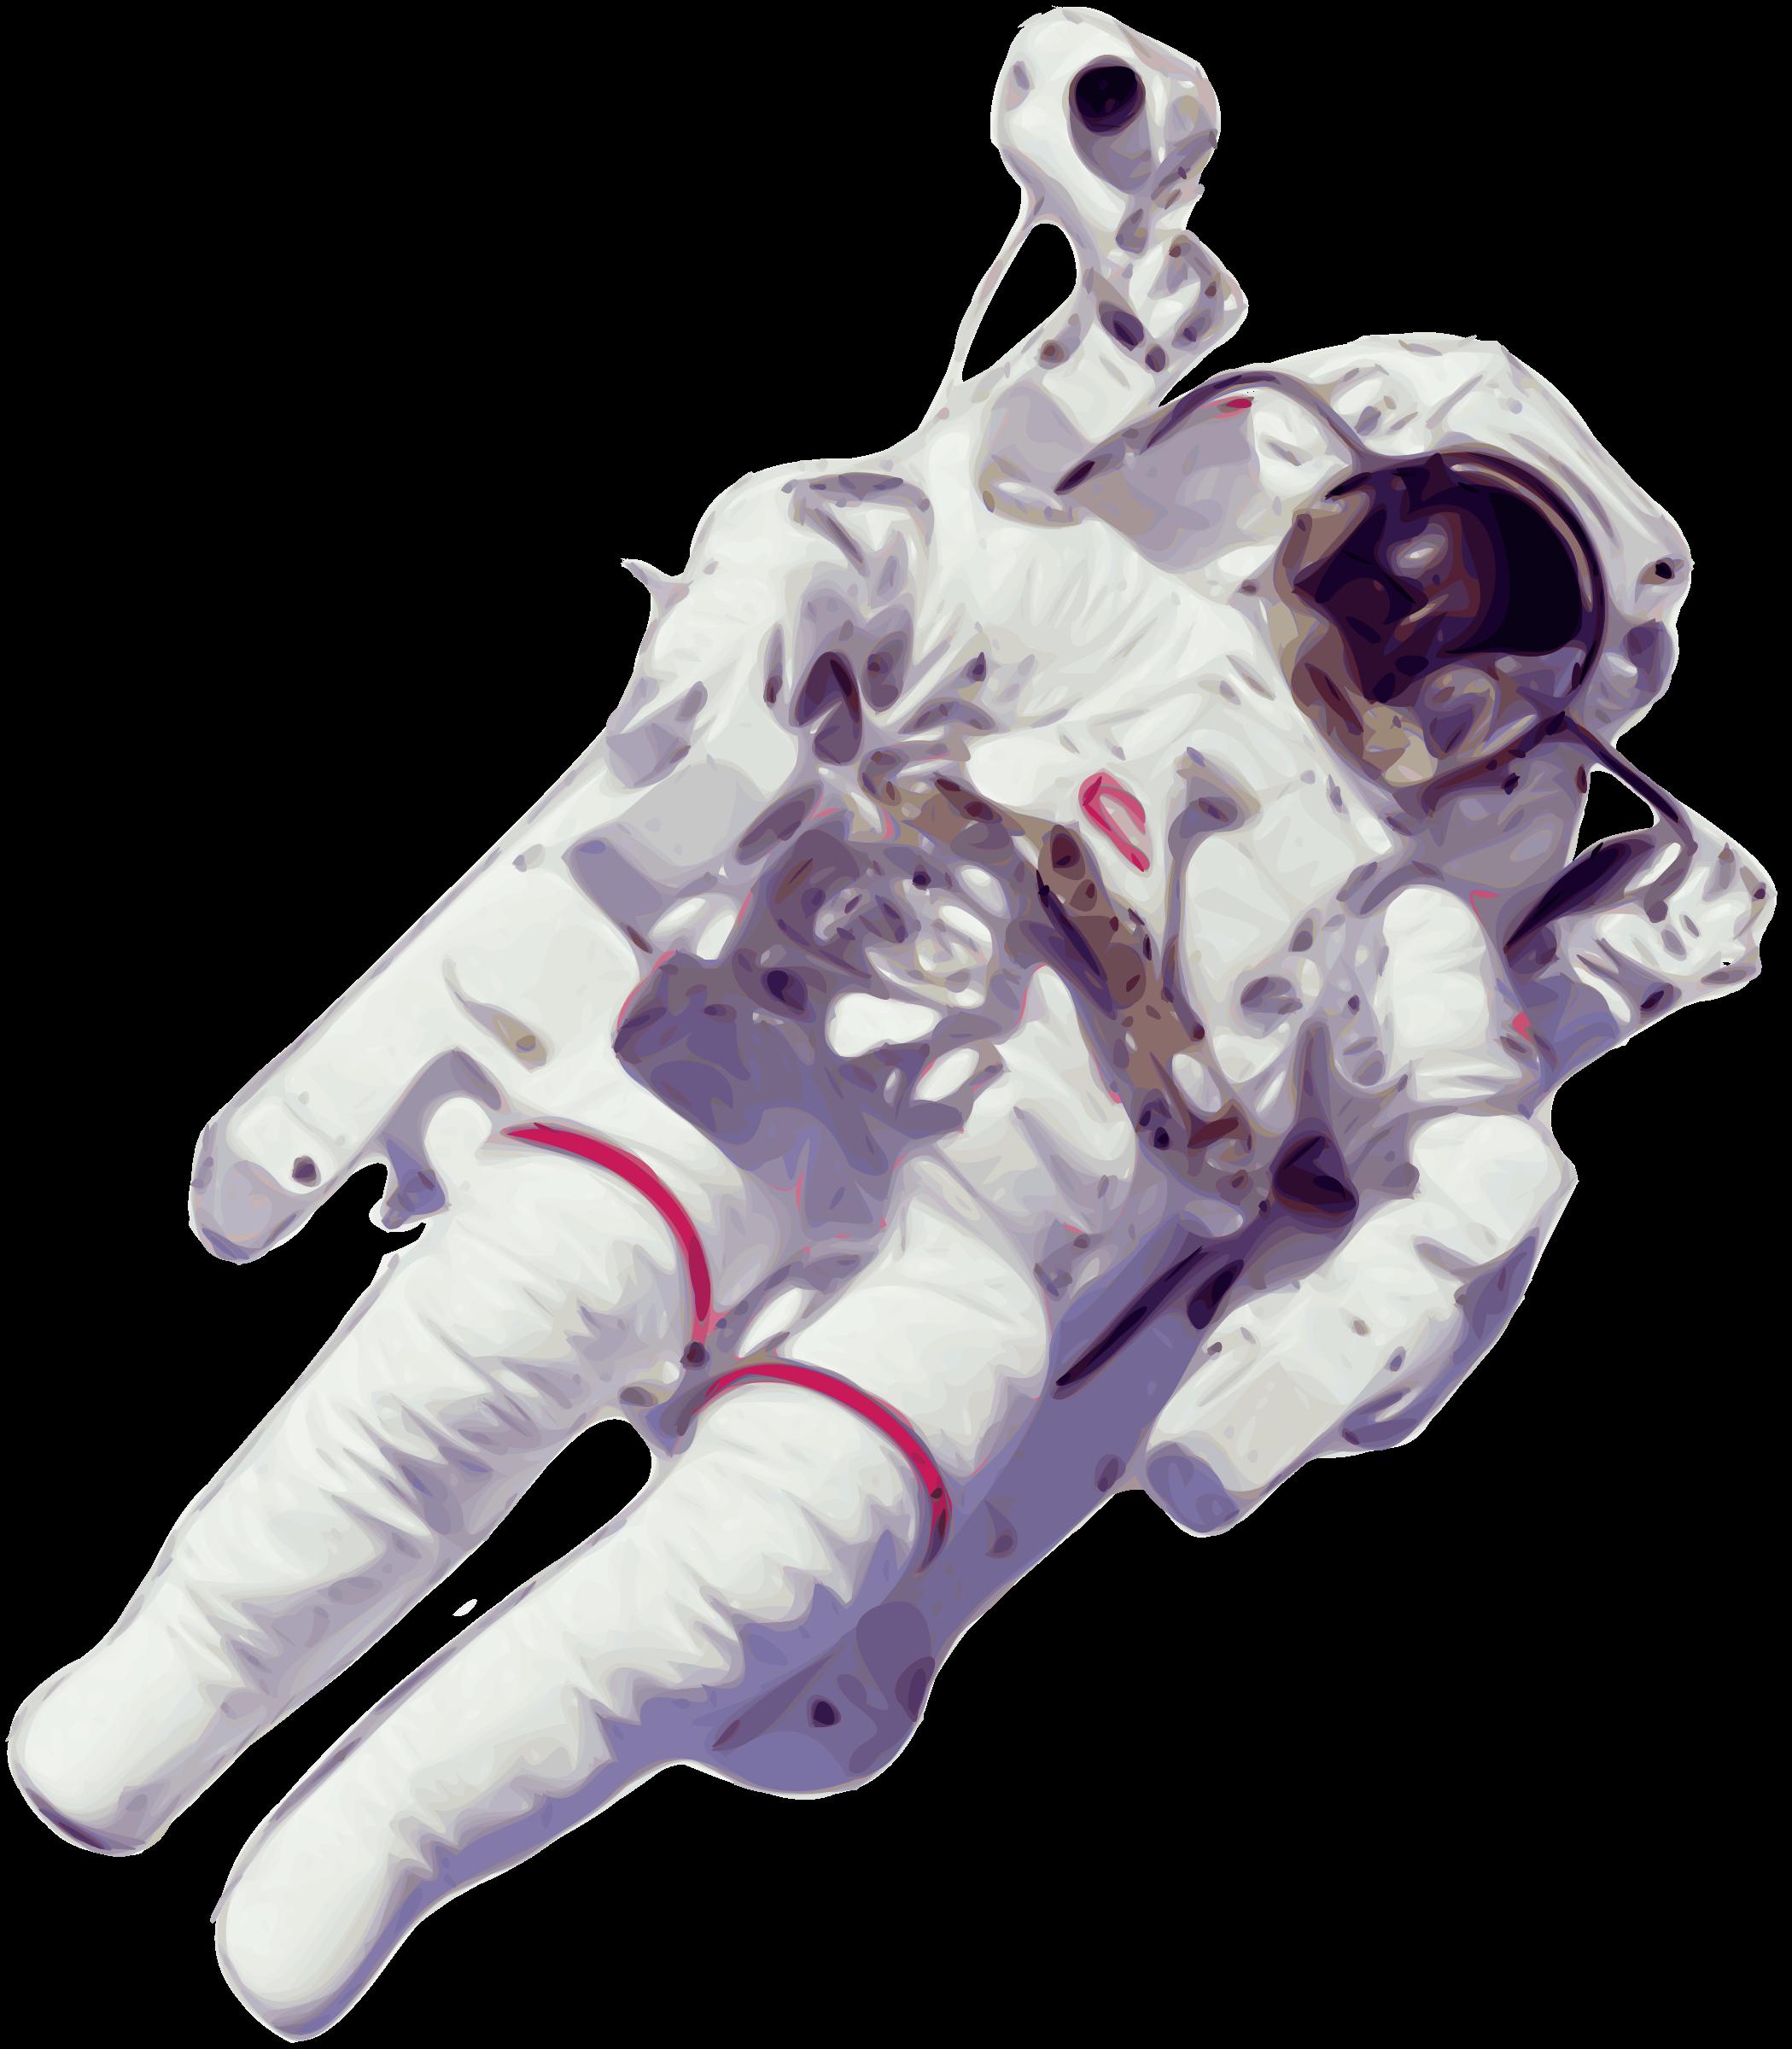 Spaceman PNG HD - 142553